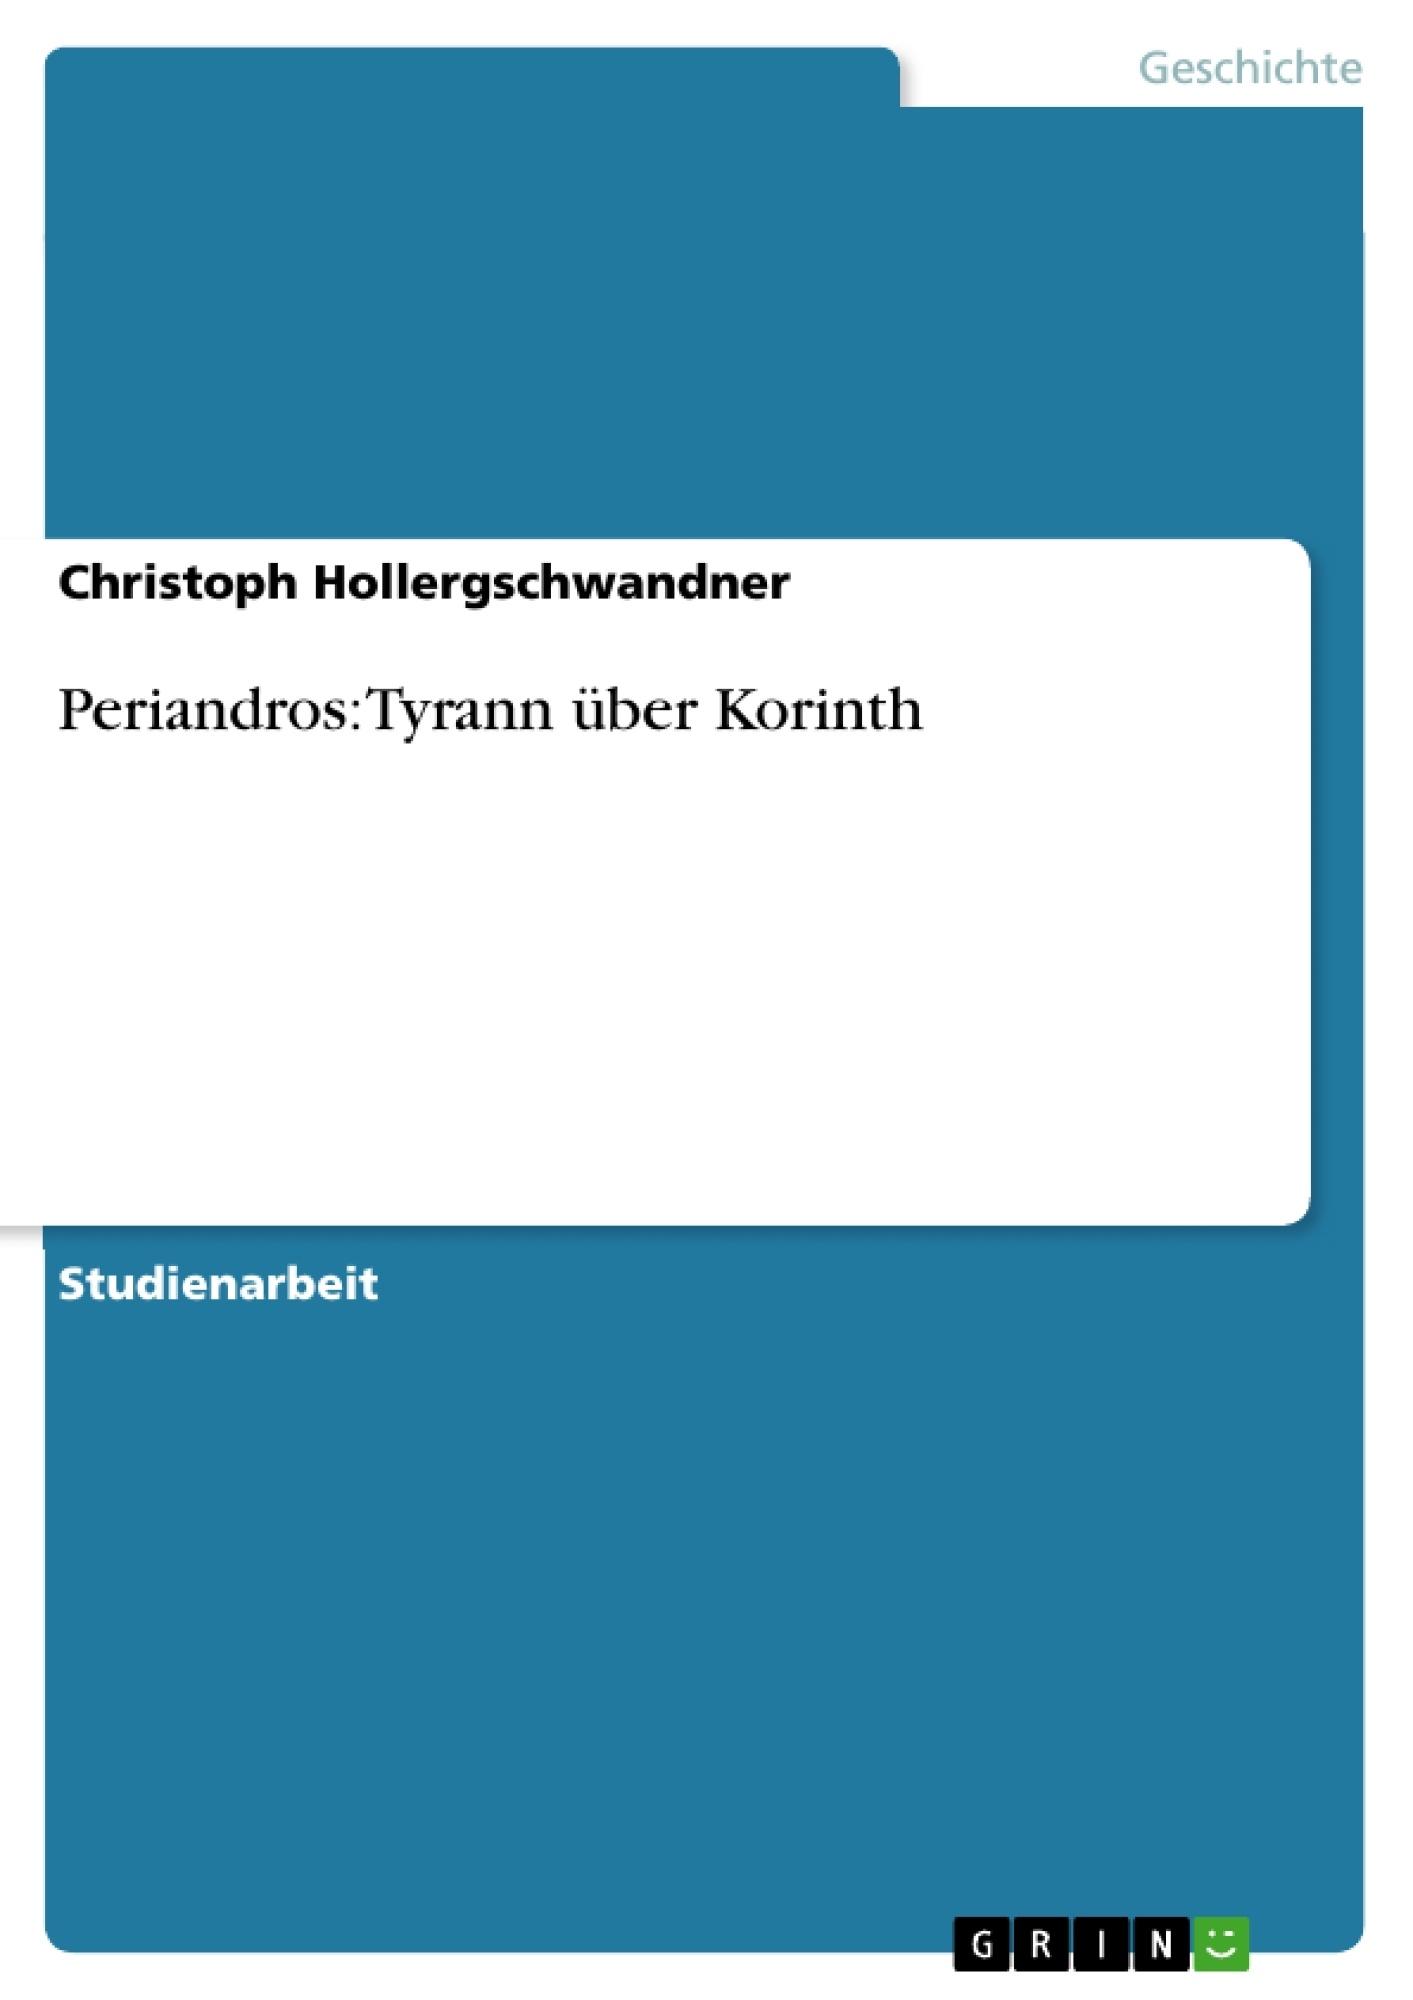 Titel: Periandros: Tyrann über Korinth